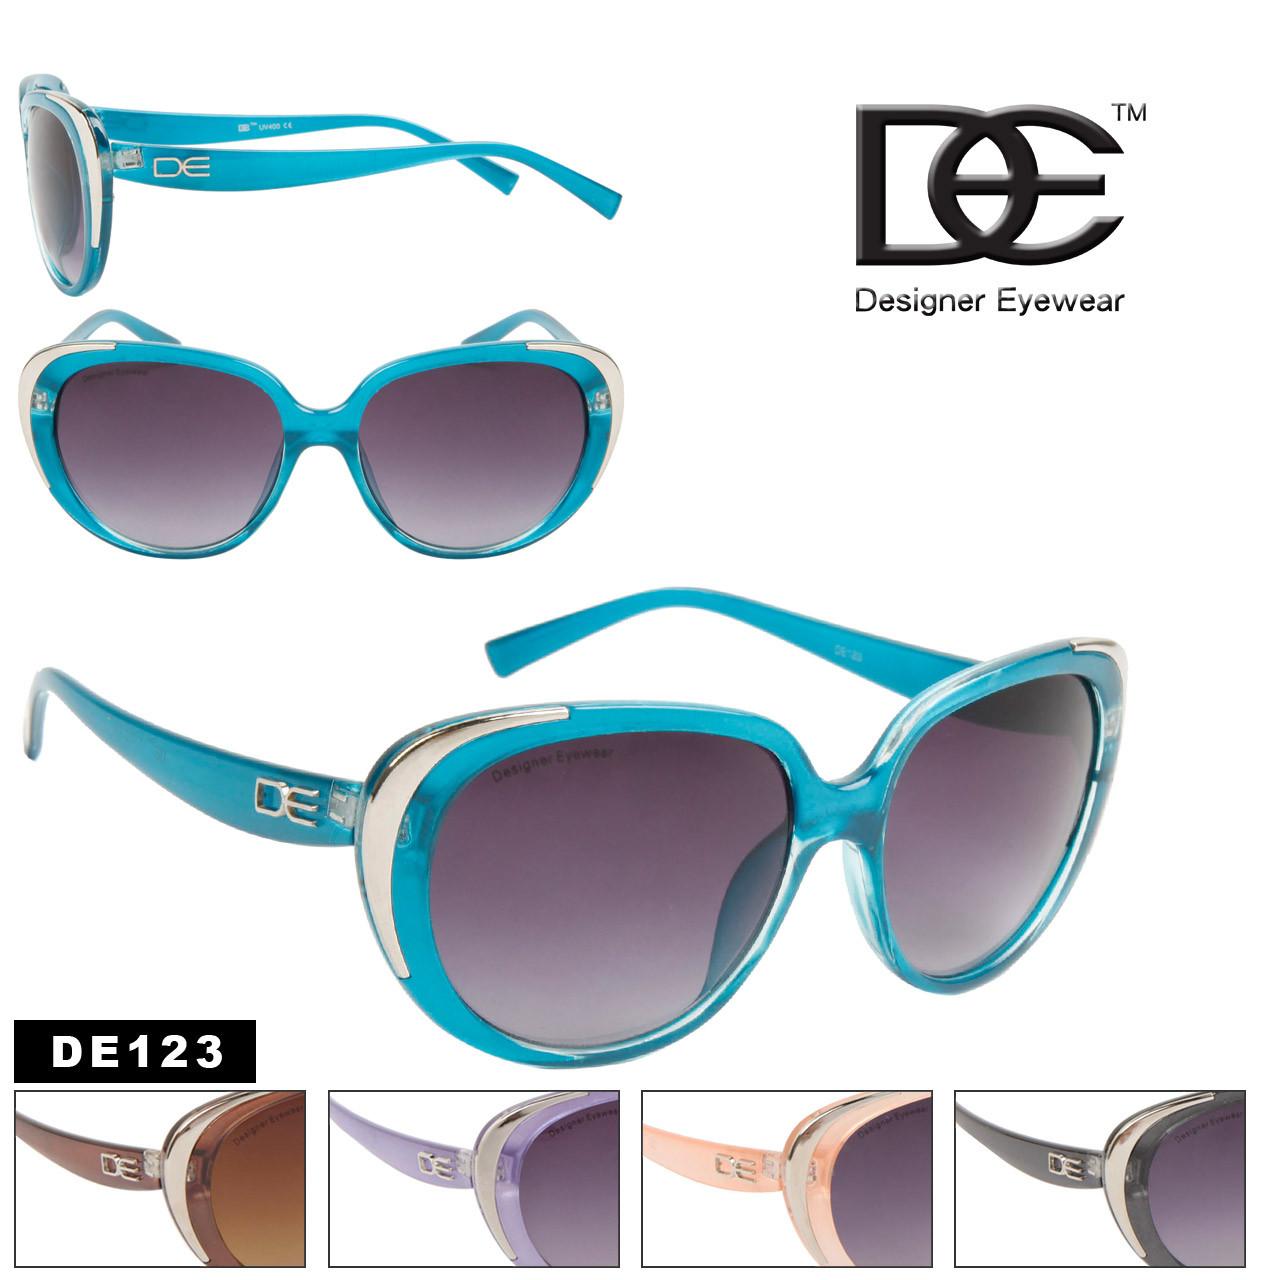 Designer Sunglasses Wholesale DE123